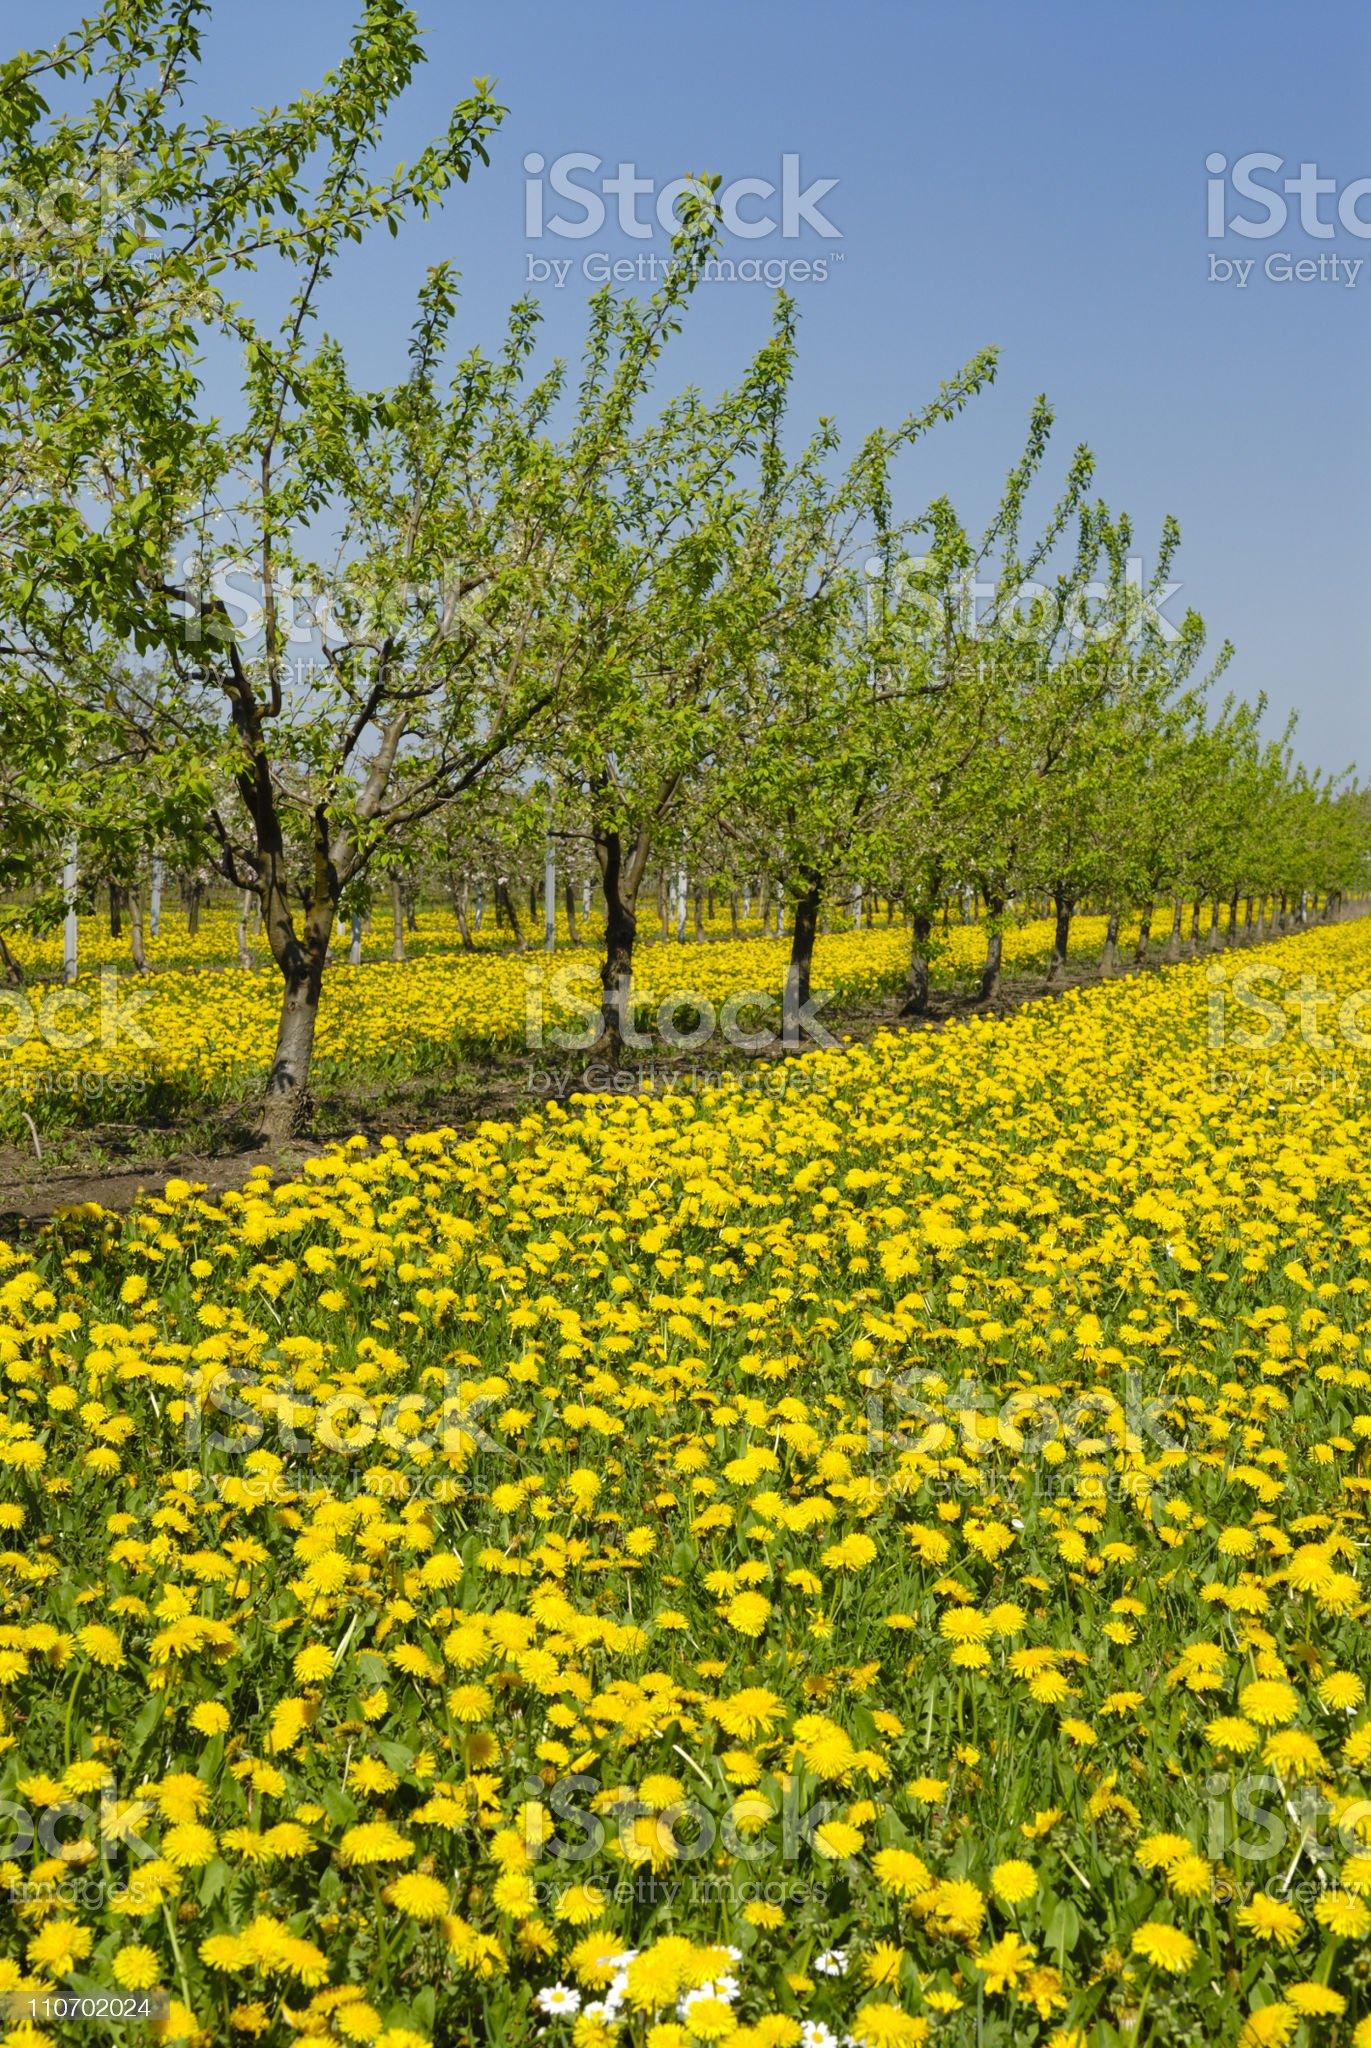 apple trees royalty-free stock photo